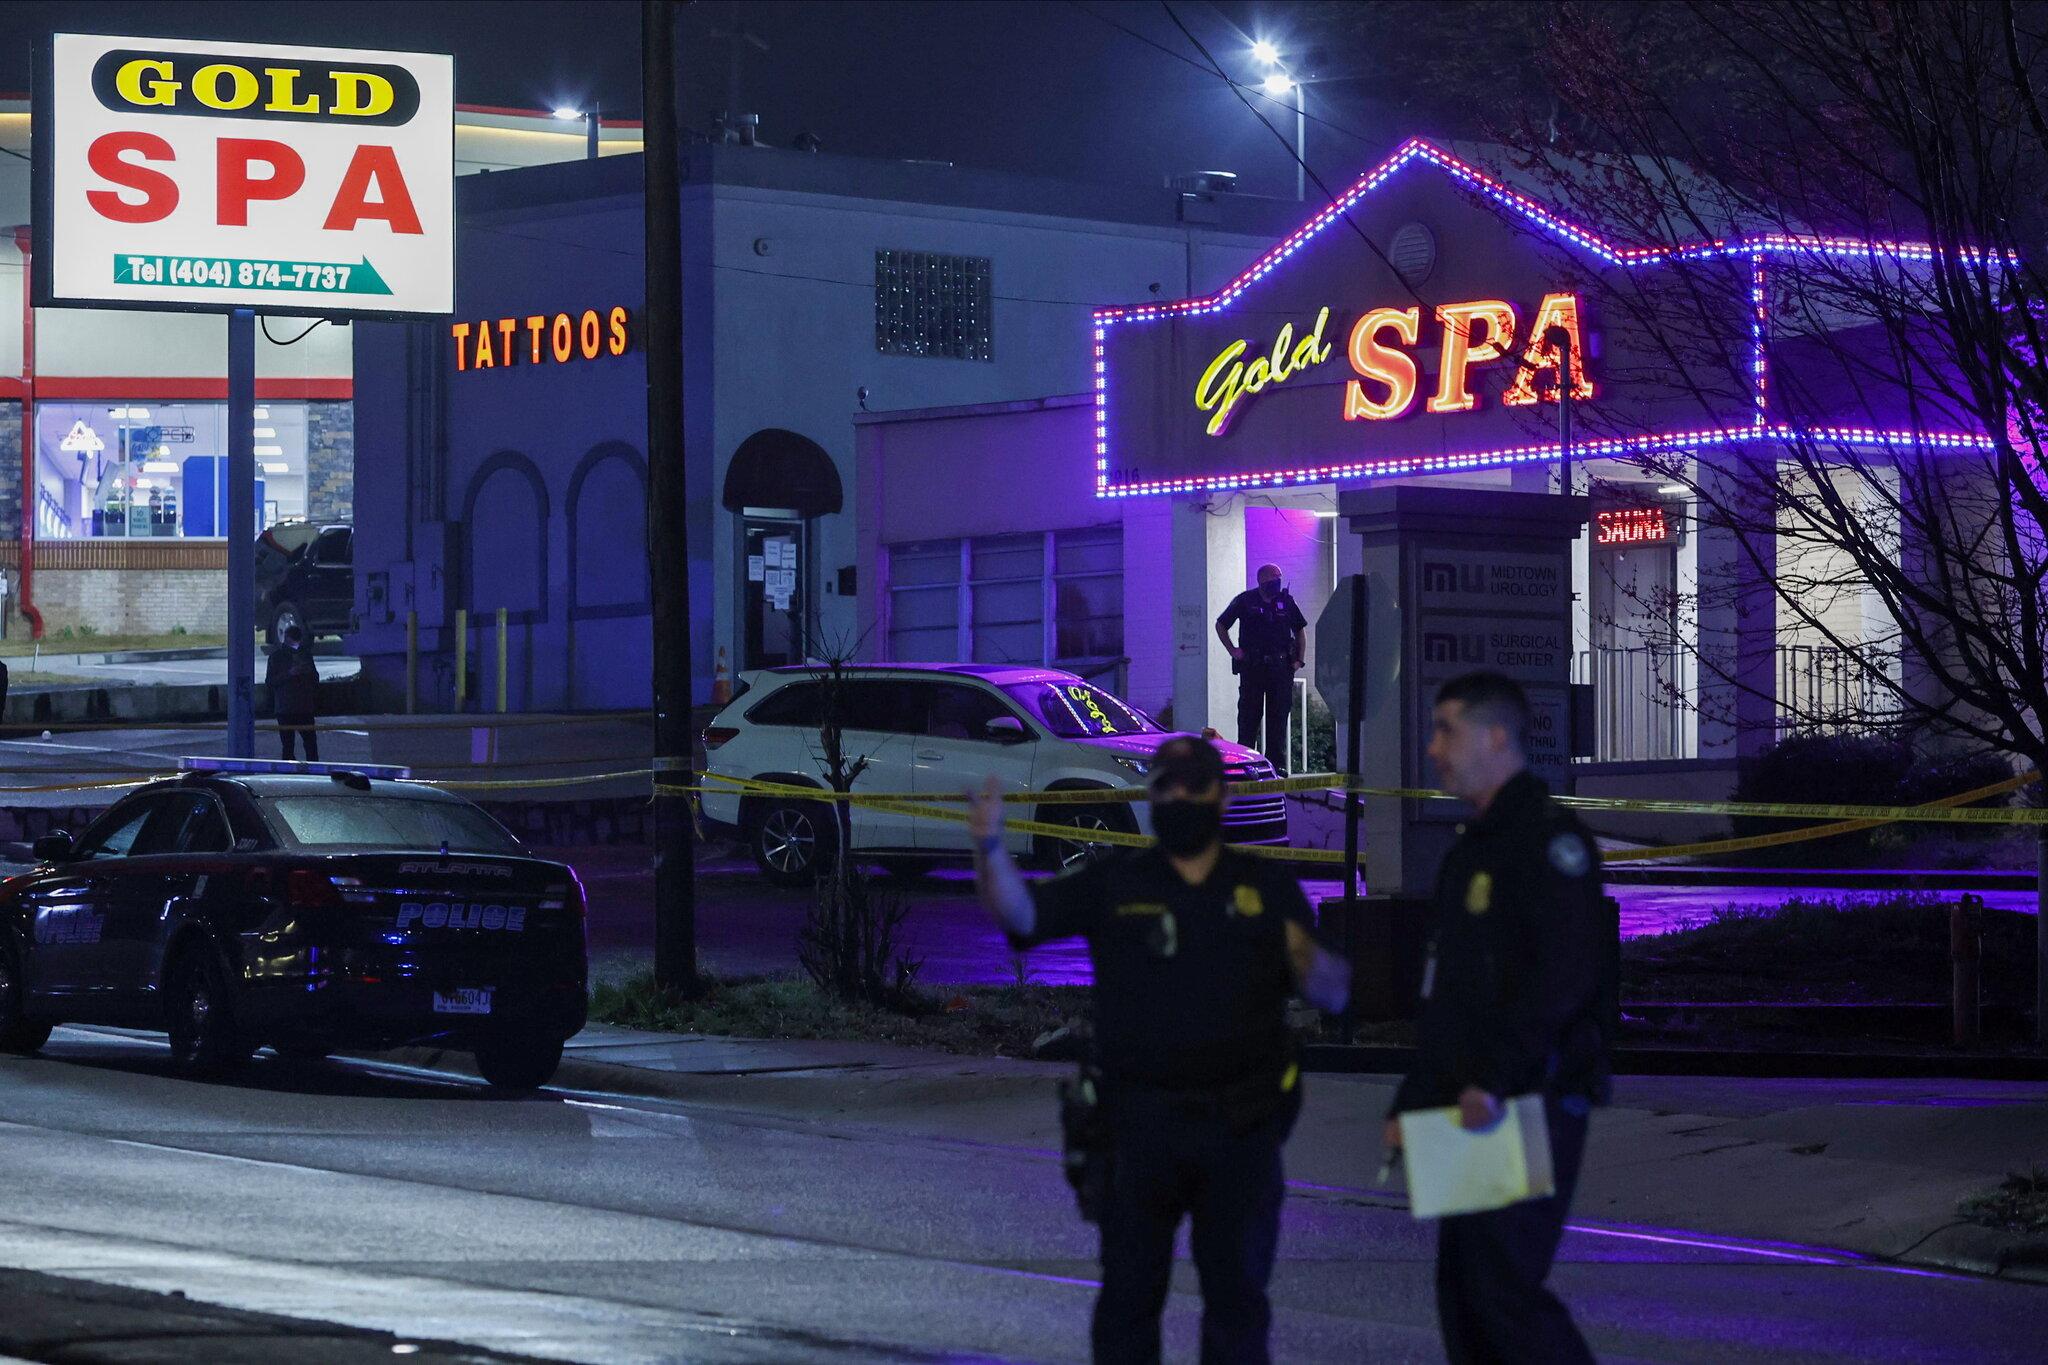 8 killed in shootings at 3 metro Atlanta spas. Police have 1 suspect in custody